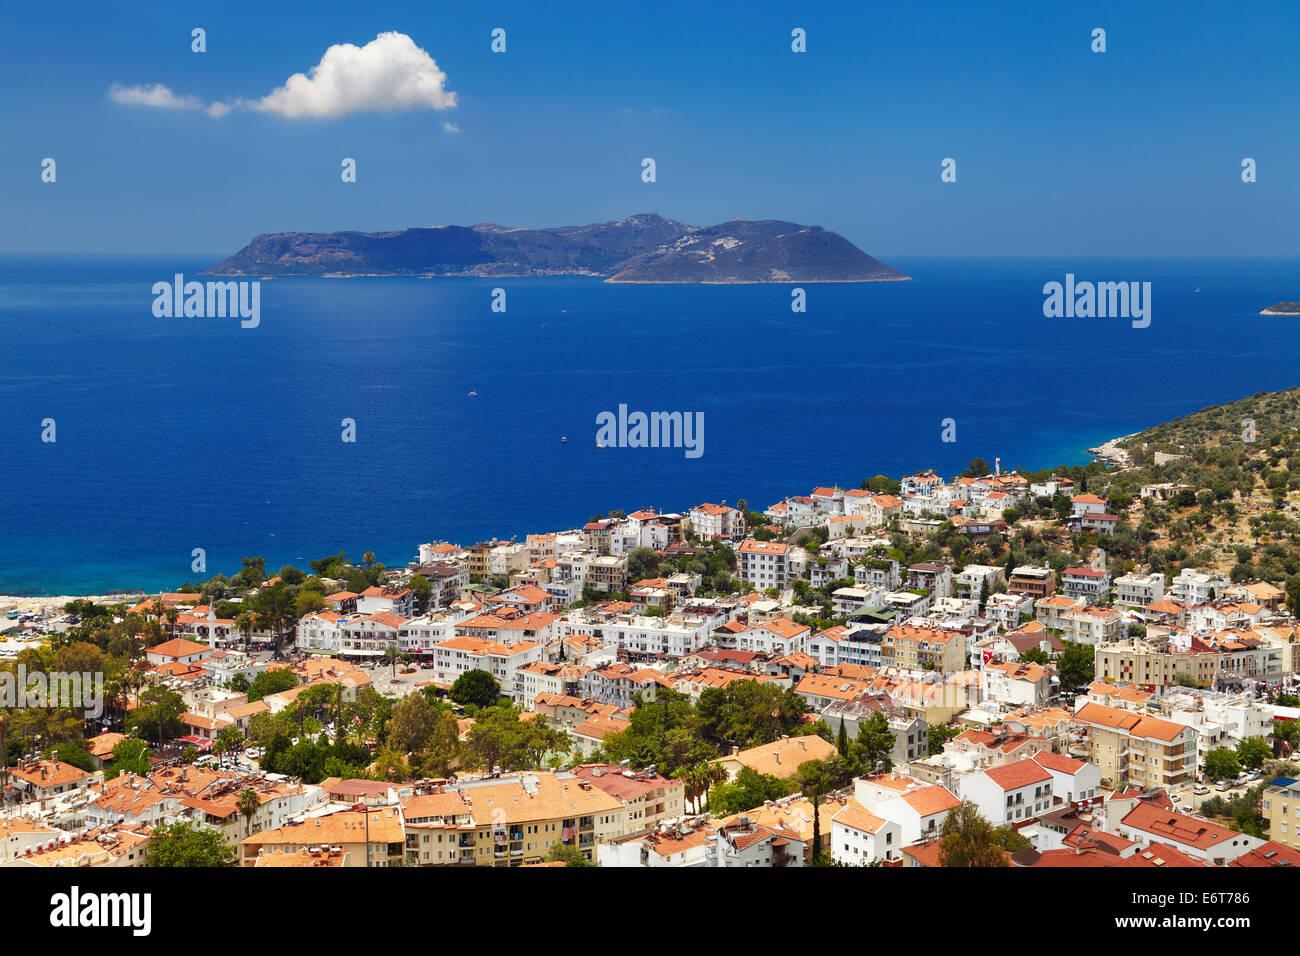 Town Kas, Mediterranean Coast, Turkey - Stock Image